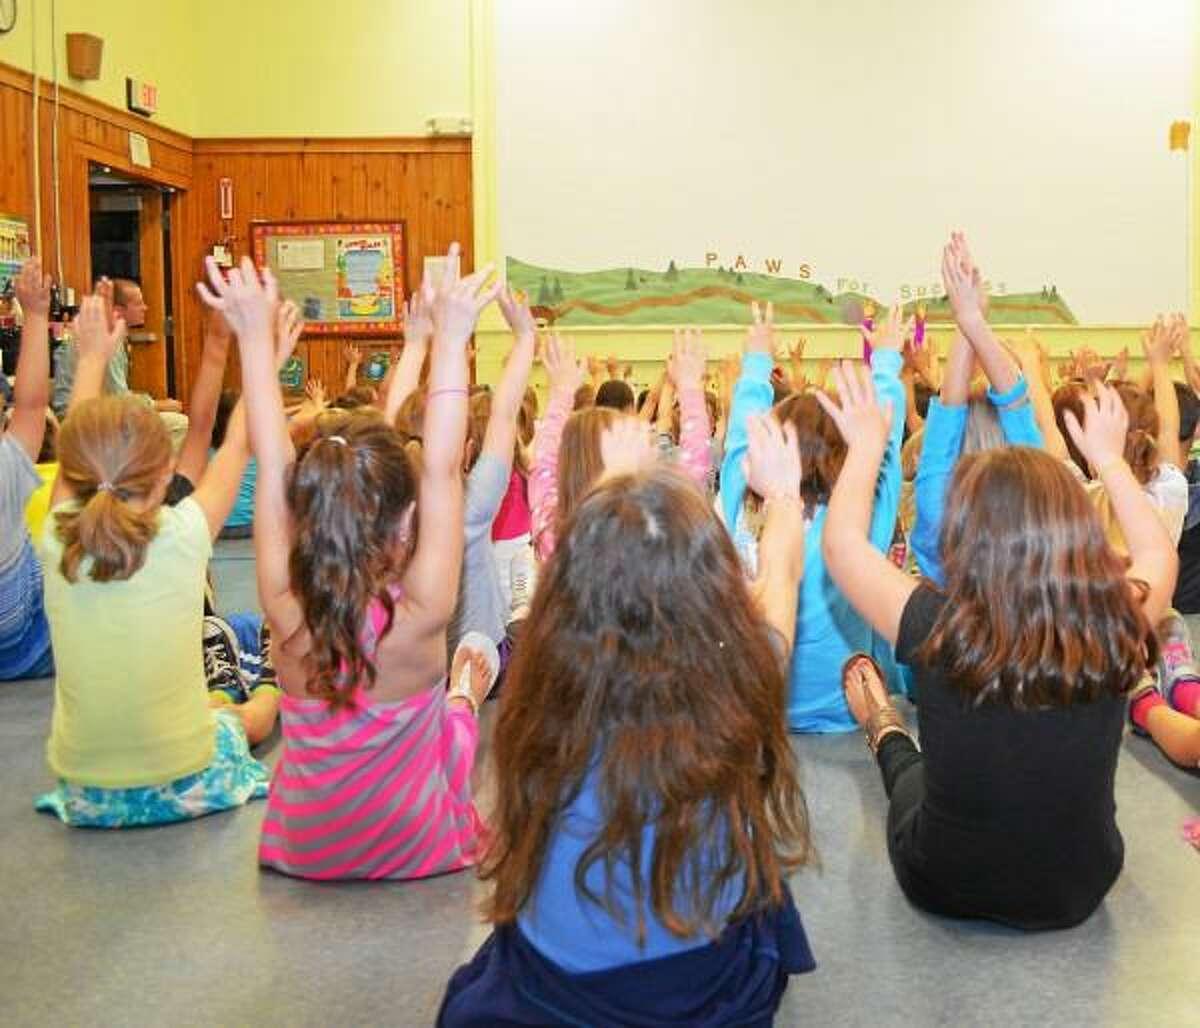 Students at New Hartford's Bakerville School listen to Miss Connecticut, Emily Audibert, speak about healthy living during a presentation Monday. (Jenny Golfin/Register Citizen)